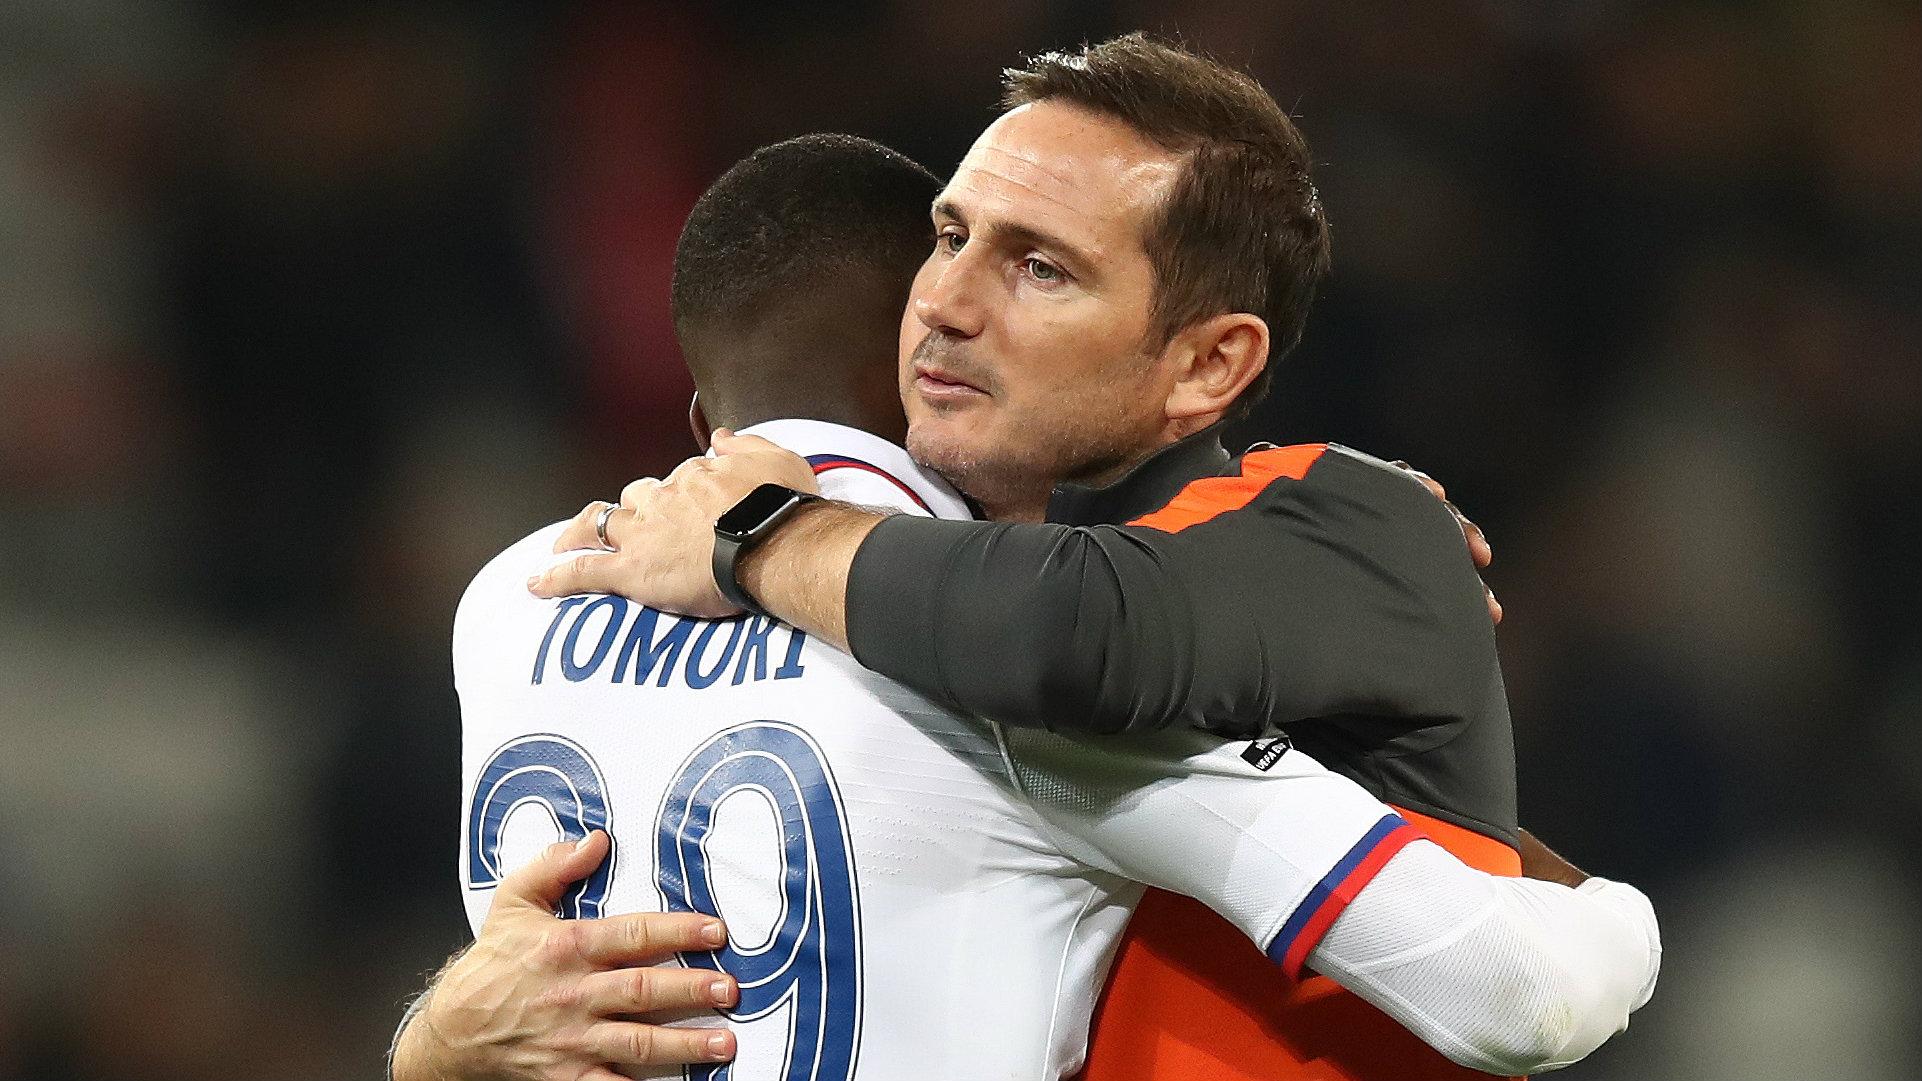 Frank Lampard Fikayo Tomori Chelsea 2019-20